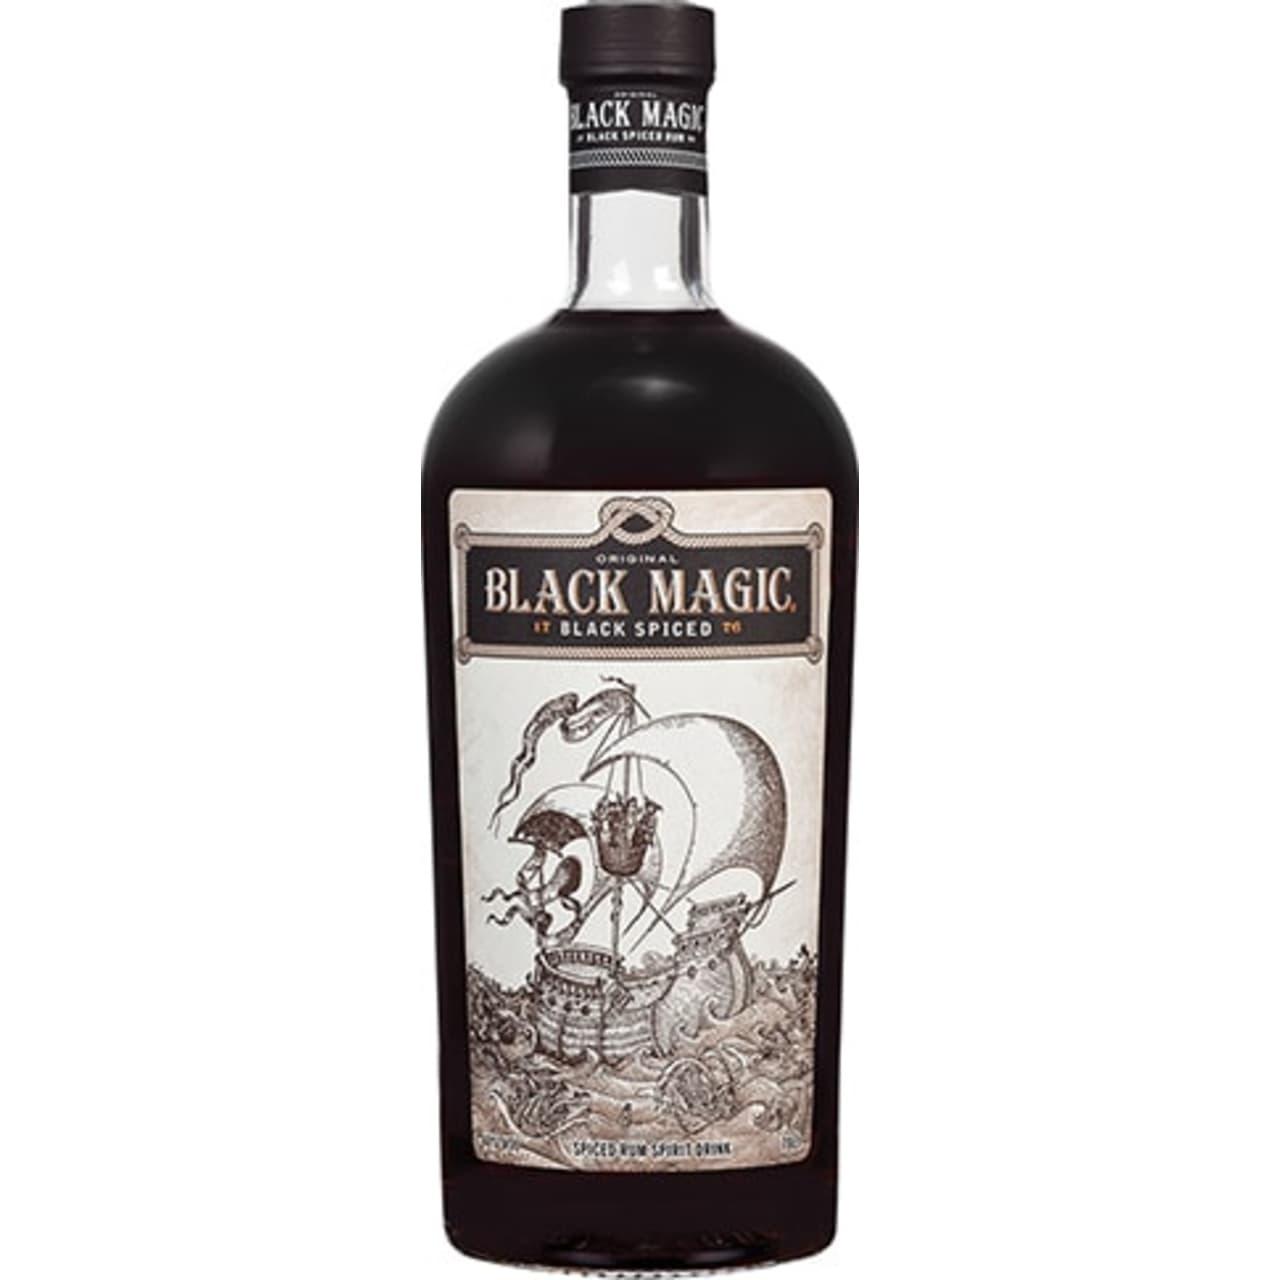 Product Image - Black Magic Spiced Rum